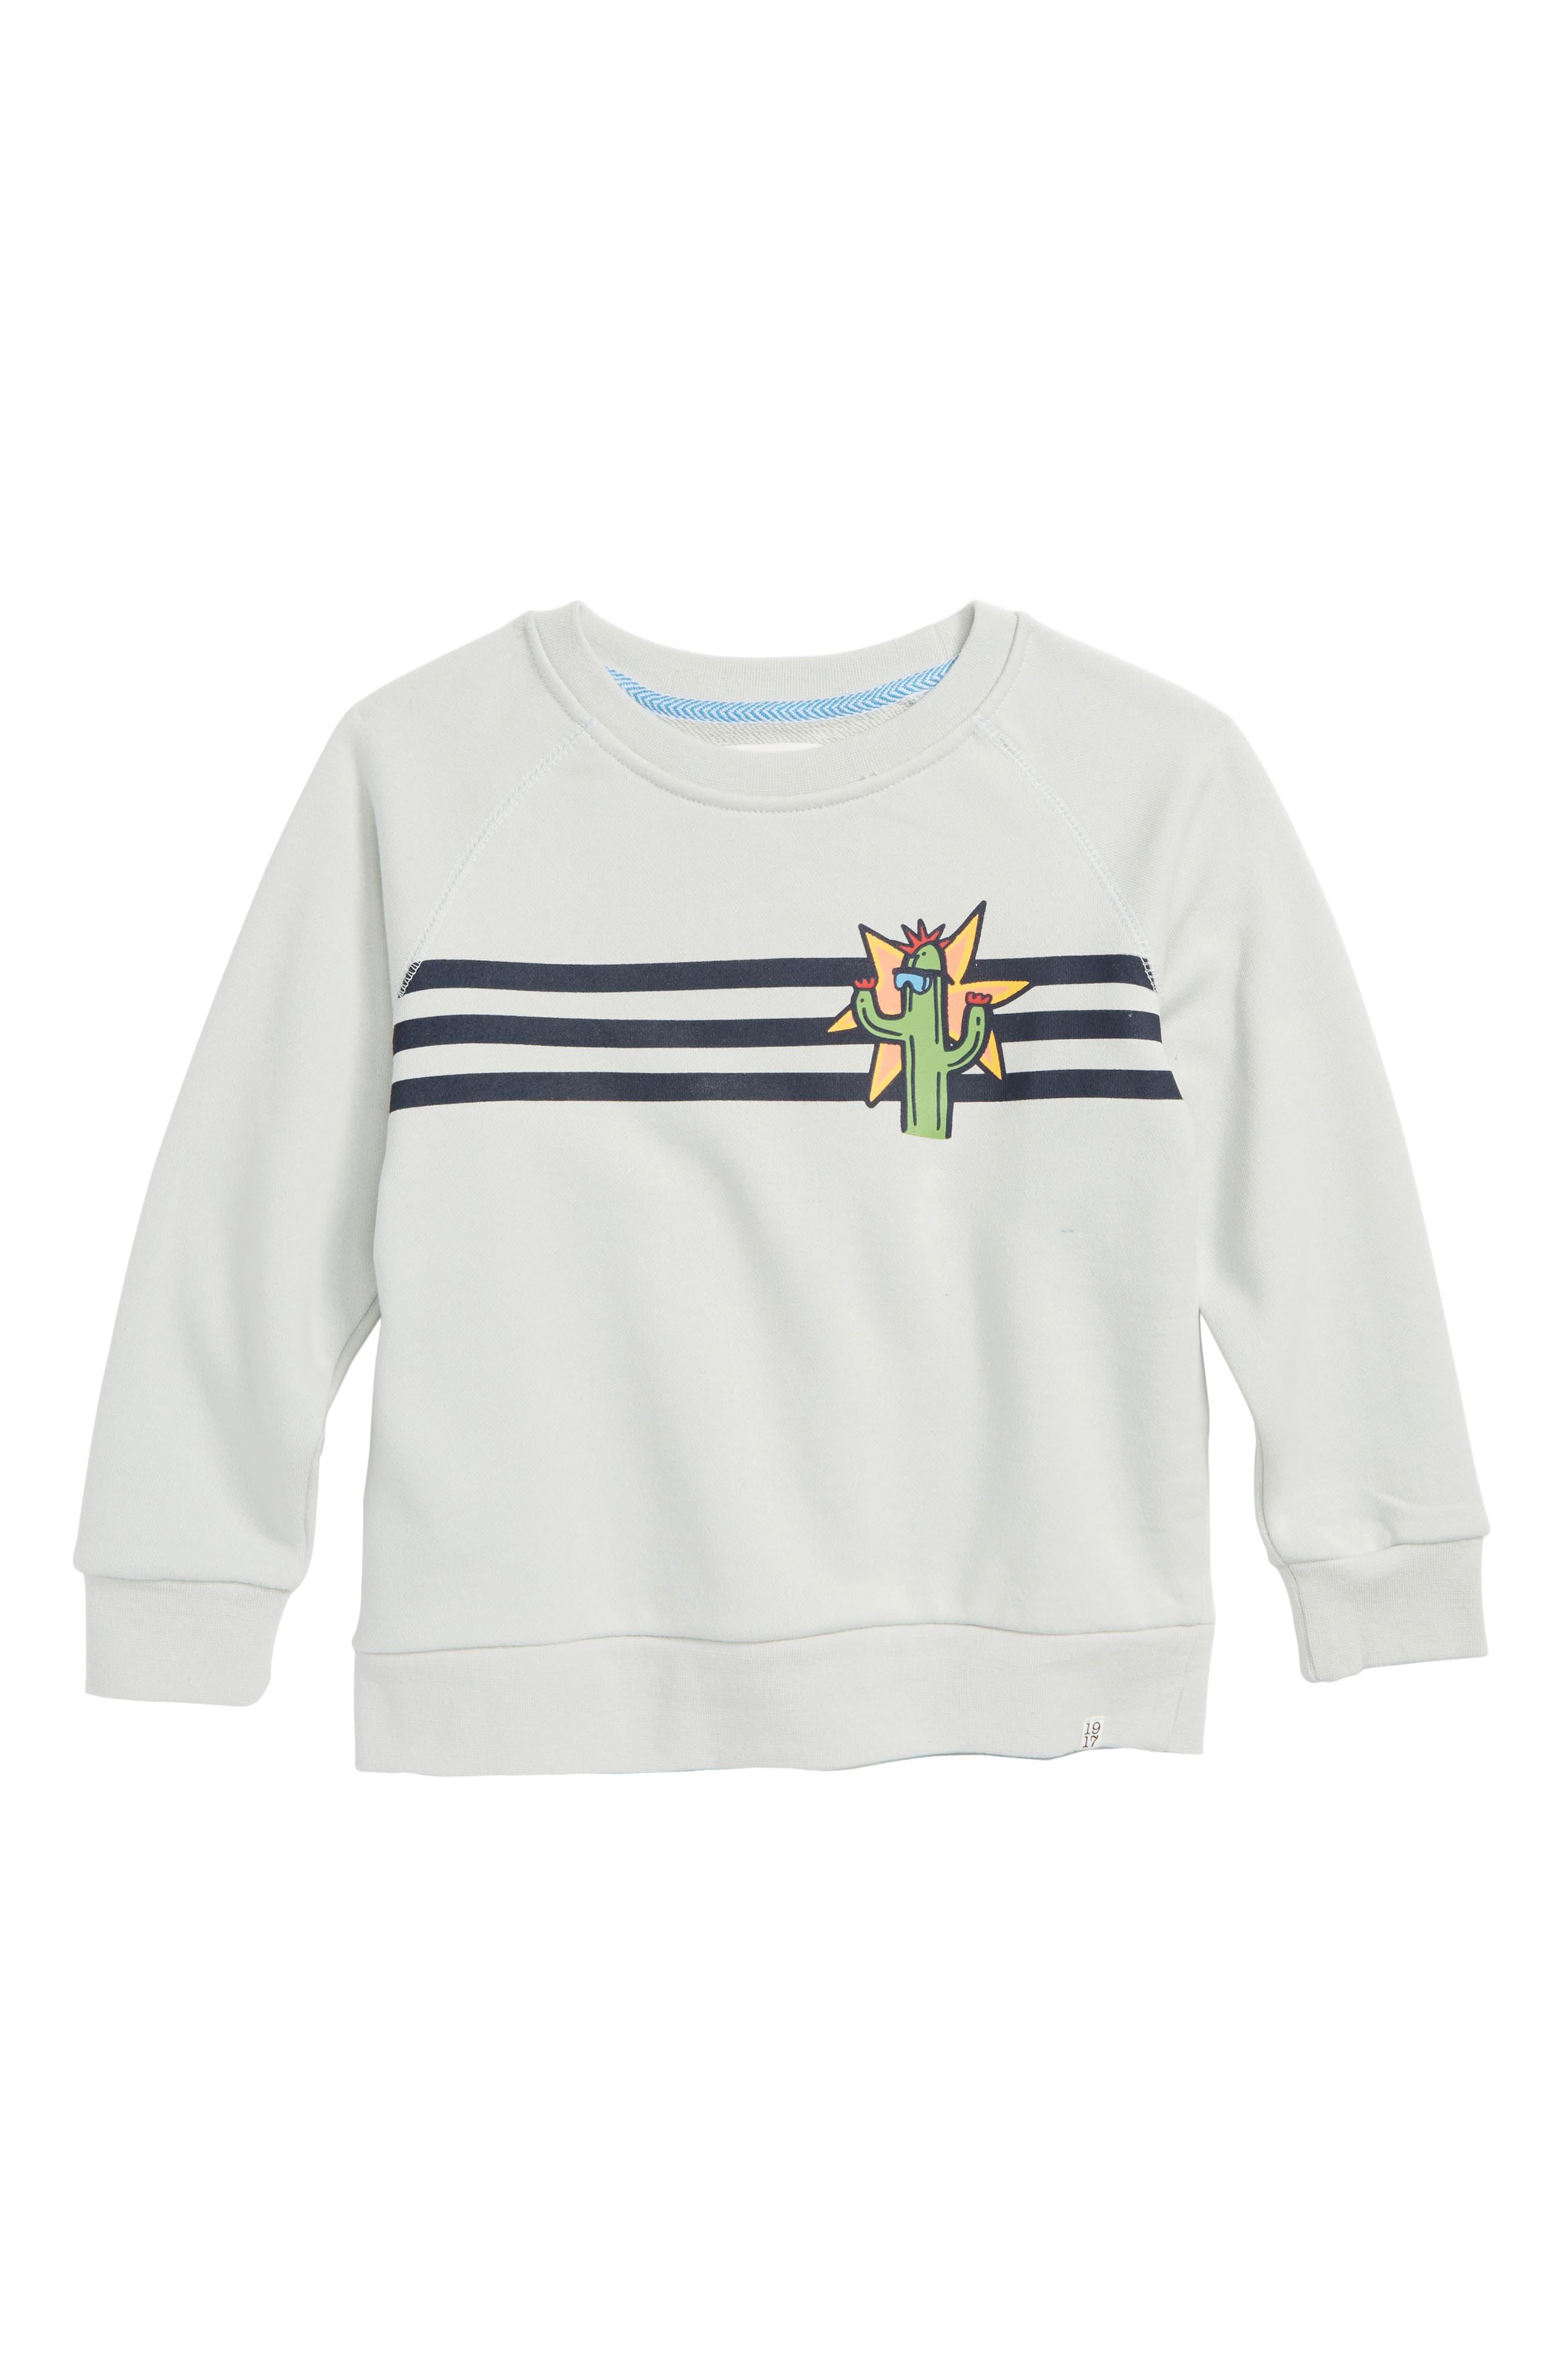 Collide T-Shirt,                             Main thumbnail 1, color,                             SKY